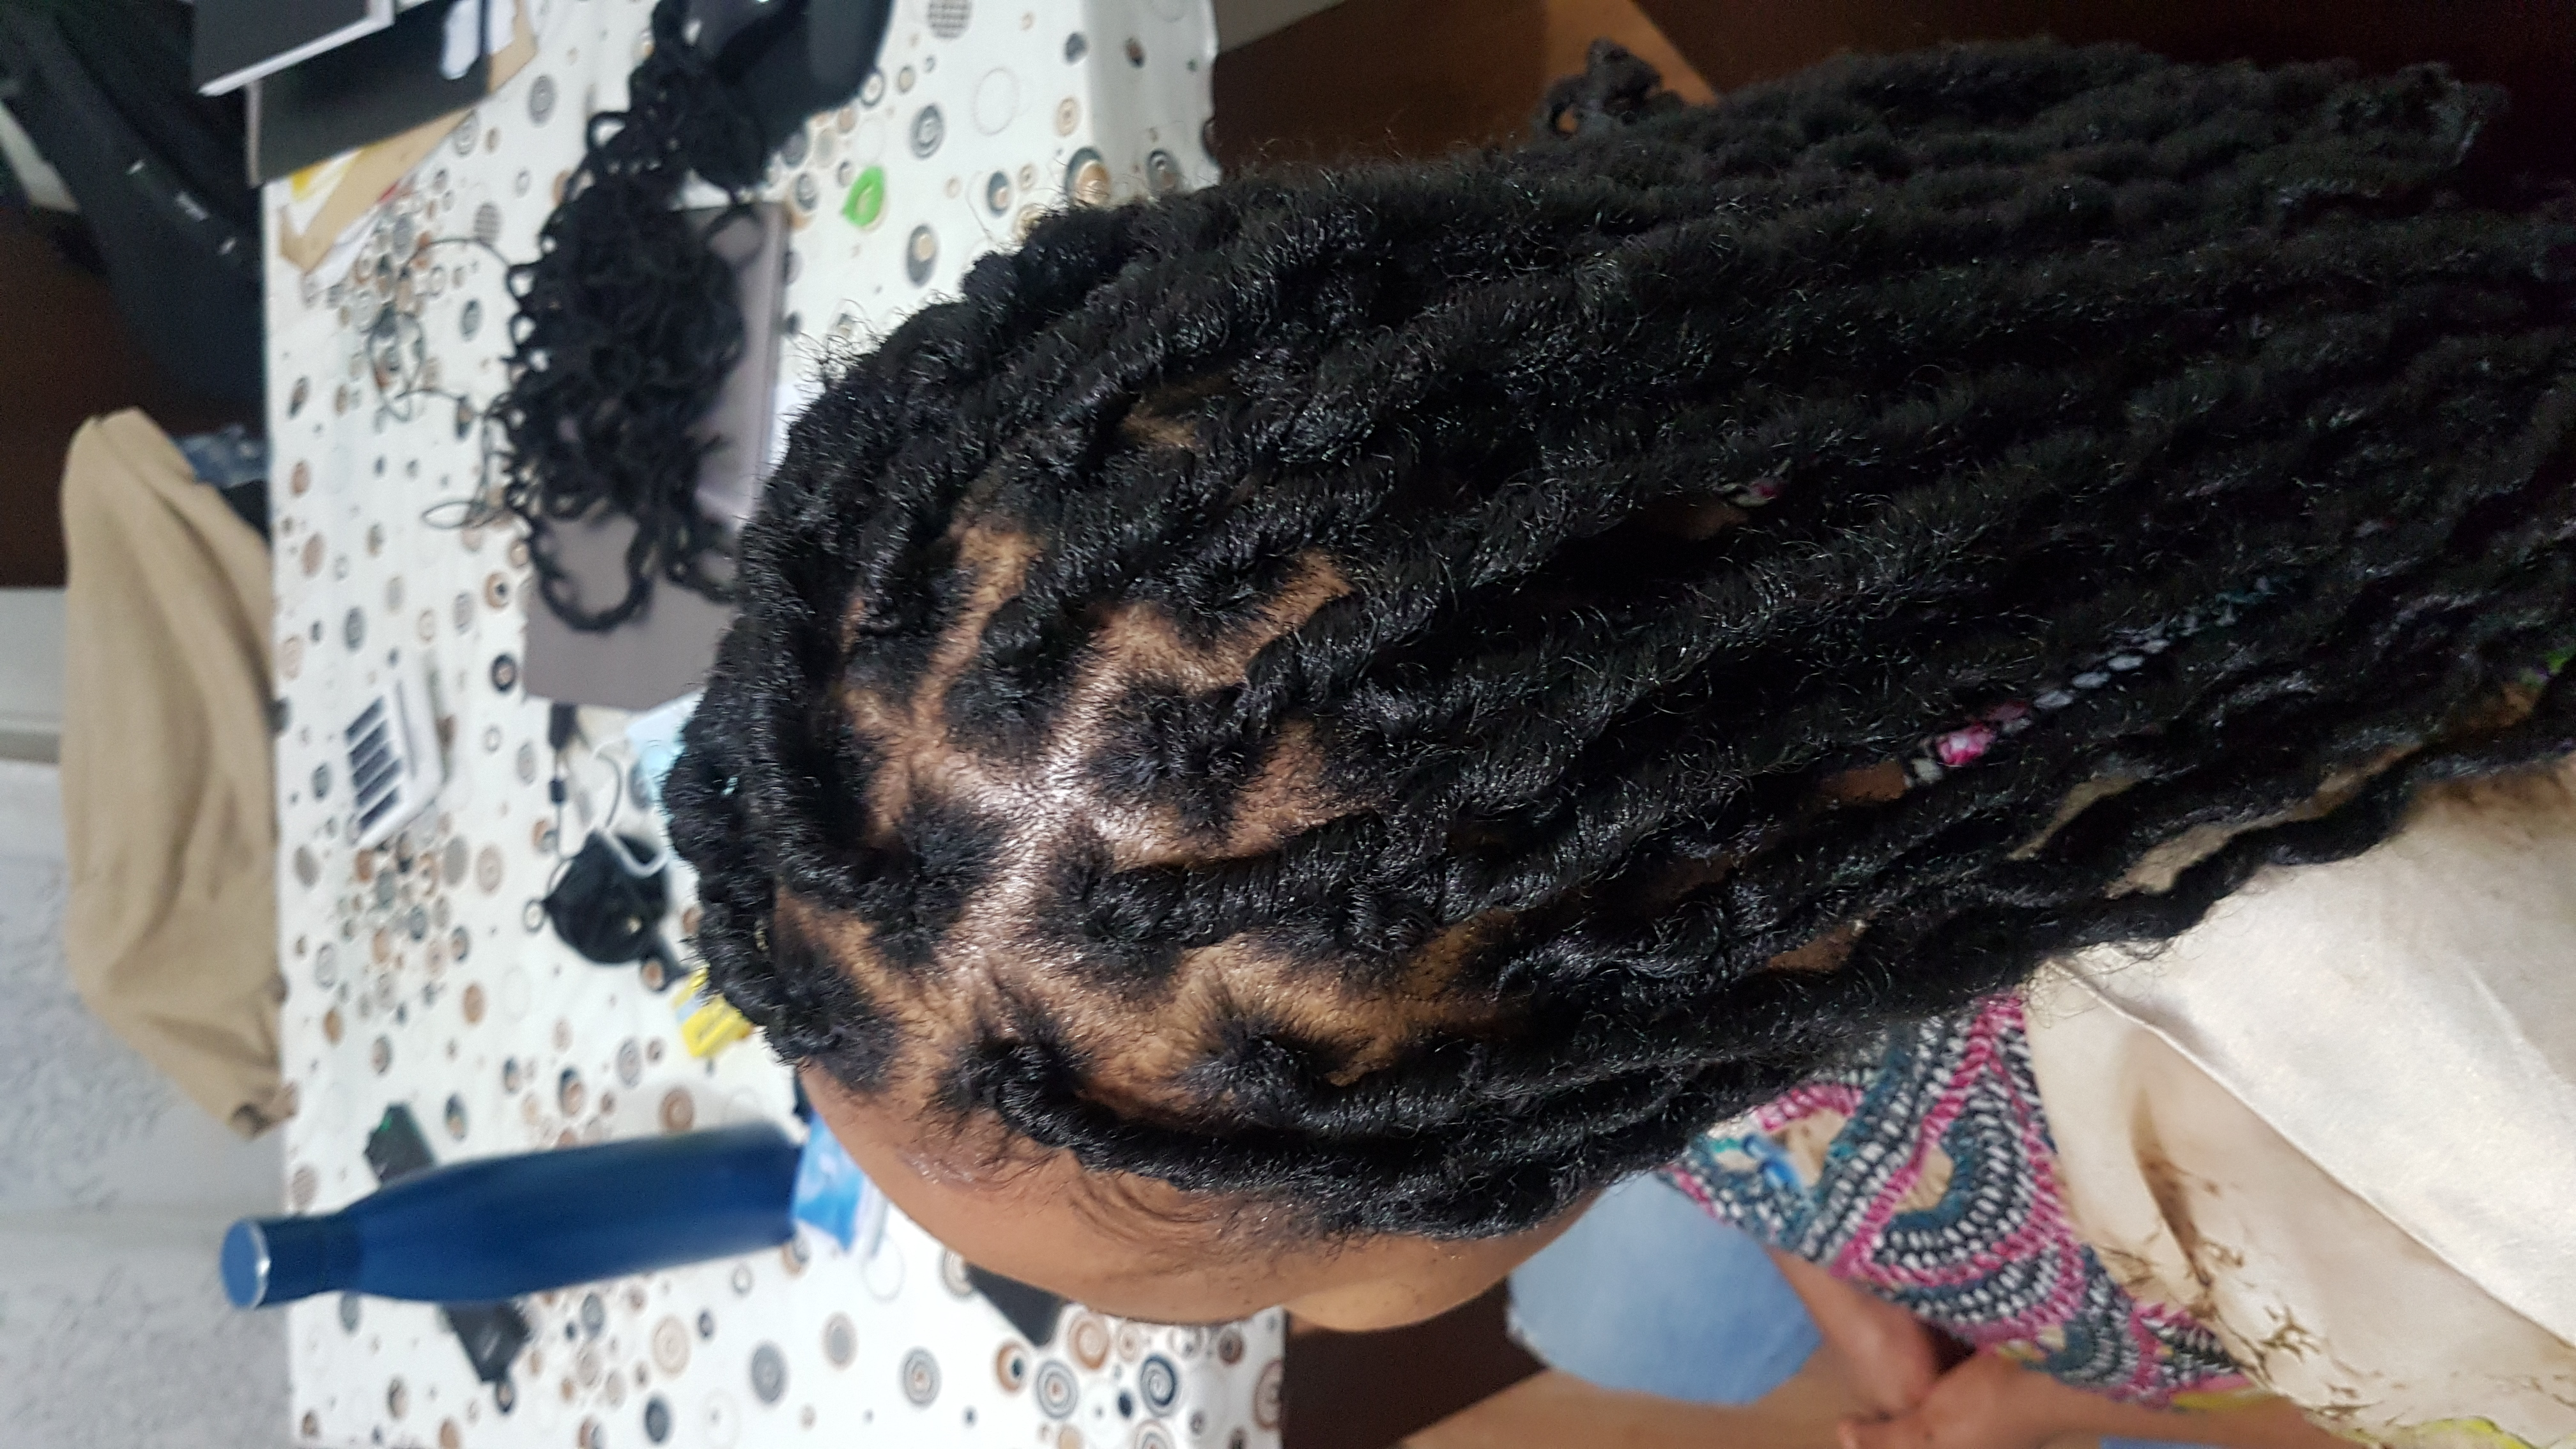 salon de coiffure afro tresse tresses box braids crochet braids vanilles tissages paris 75 77 78 91 92 93 94 95 BBPGKOFZ